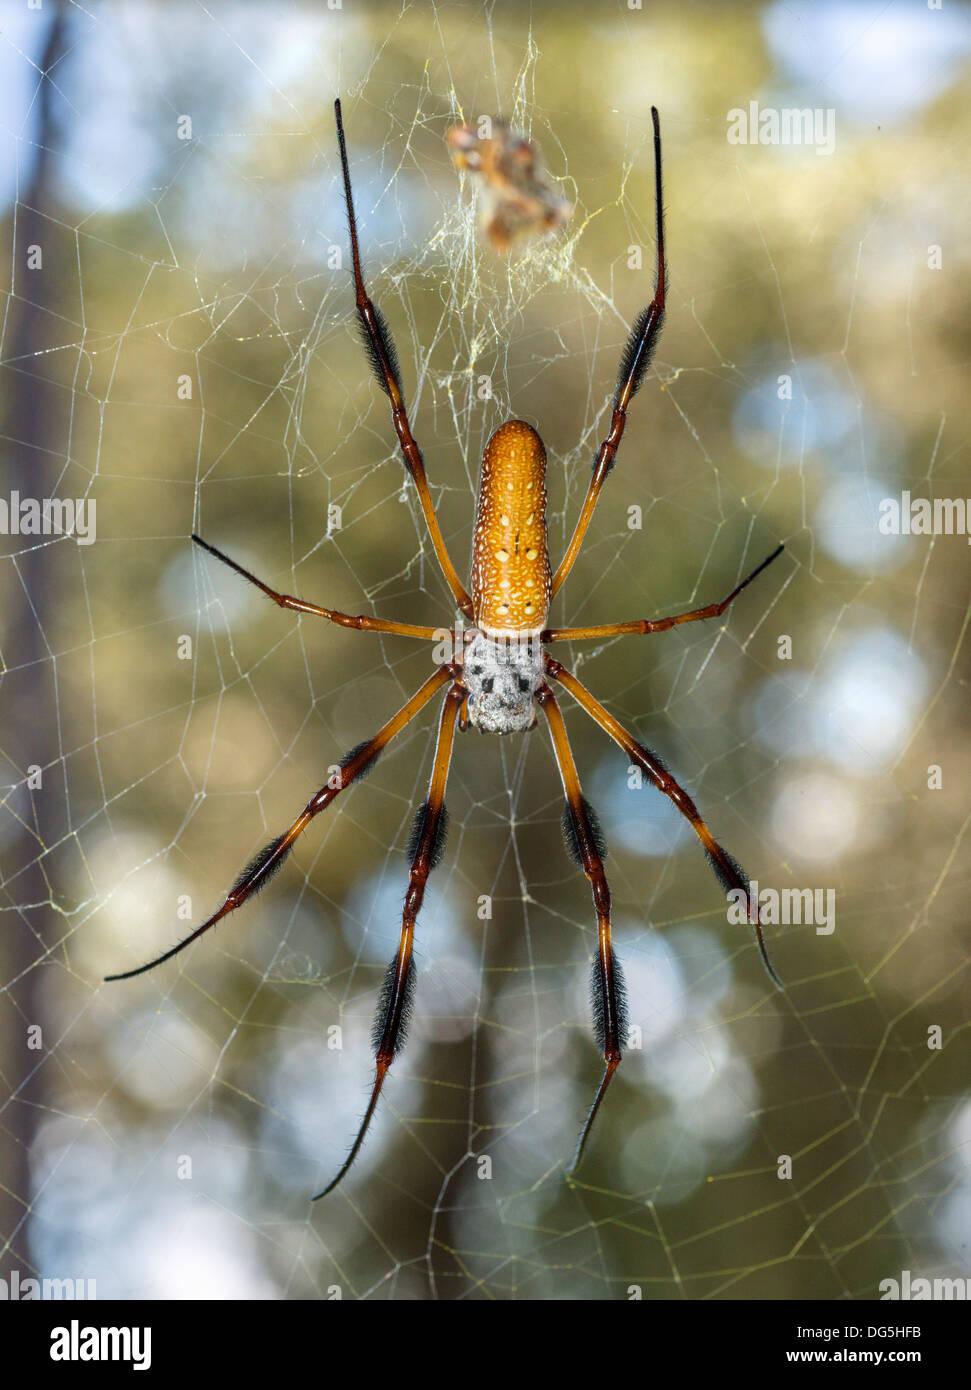 Female Golden silk orb-weaver / Banana spider ( Nephila clavipes ), Central Florida, USA - Stock Image